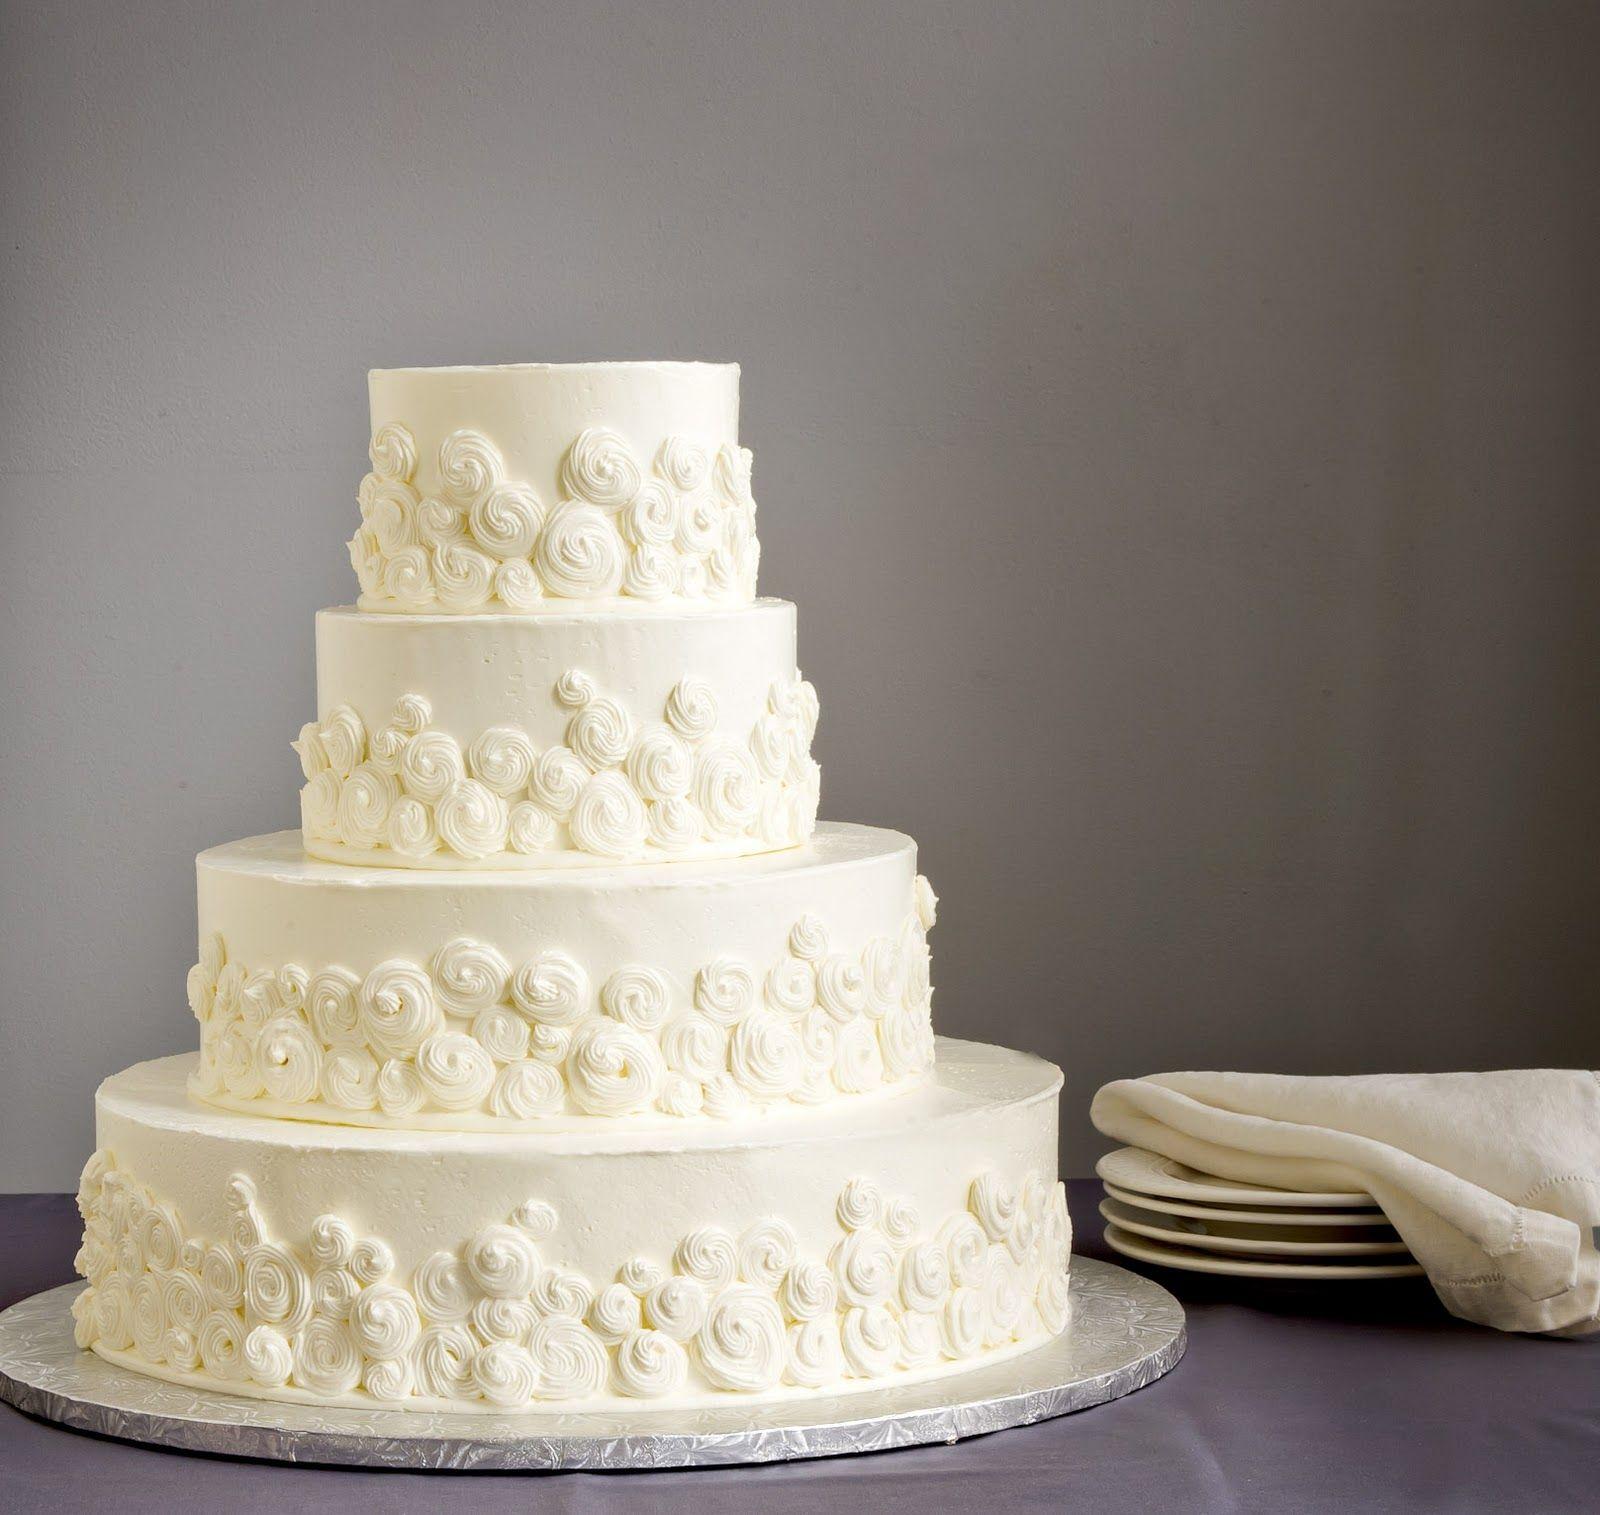 Image result for simple wedding cake designs wedding ideas